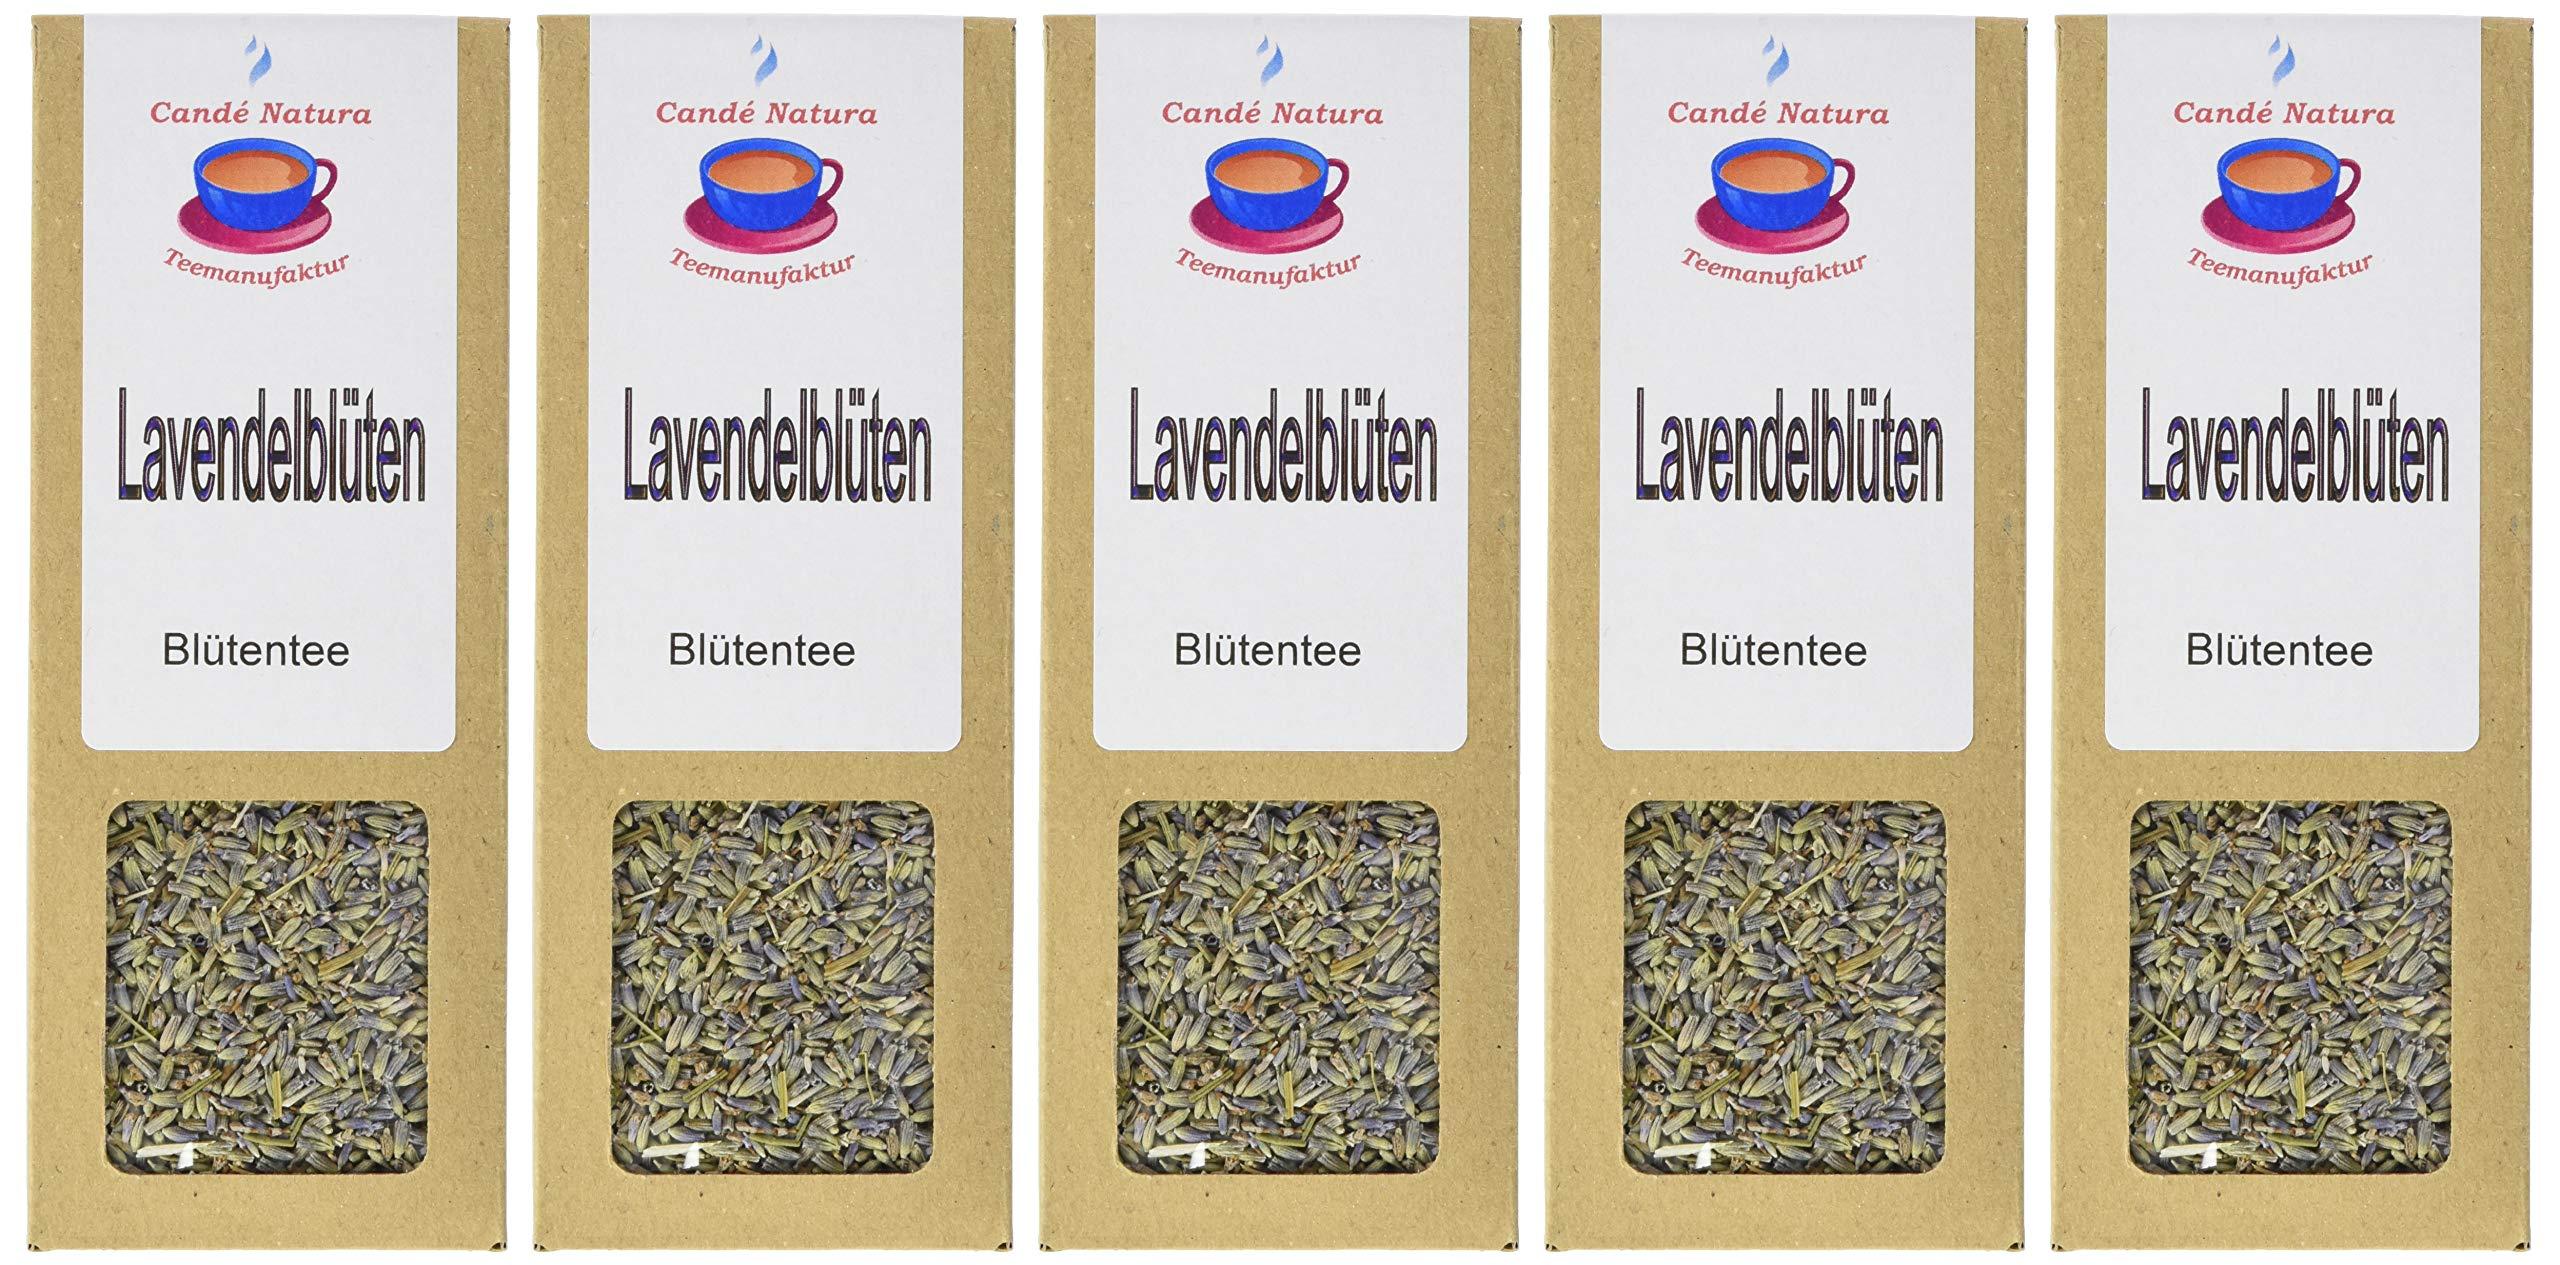 Cand-Natura-Teemanufaktur-Lavendelblten-pur-5er-Pack-5-x-50-g